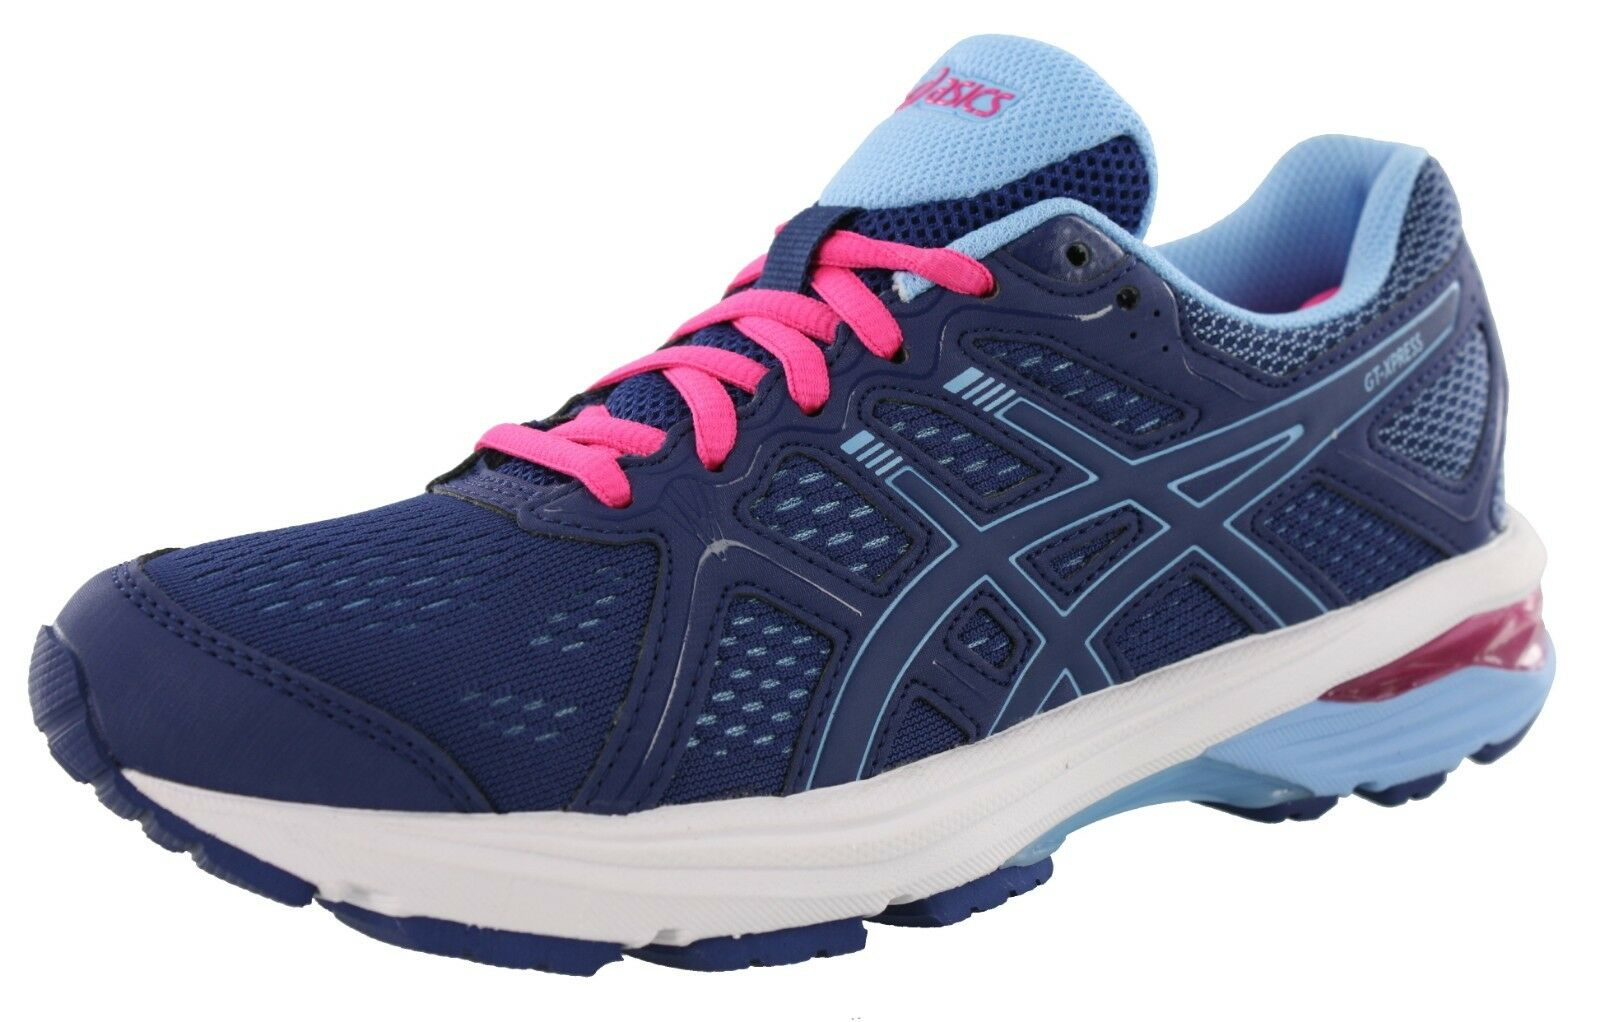 ASICS ASICS ASICS donna GT-XPRESS RUNNING scarpe 0b1533